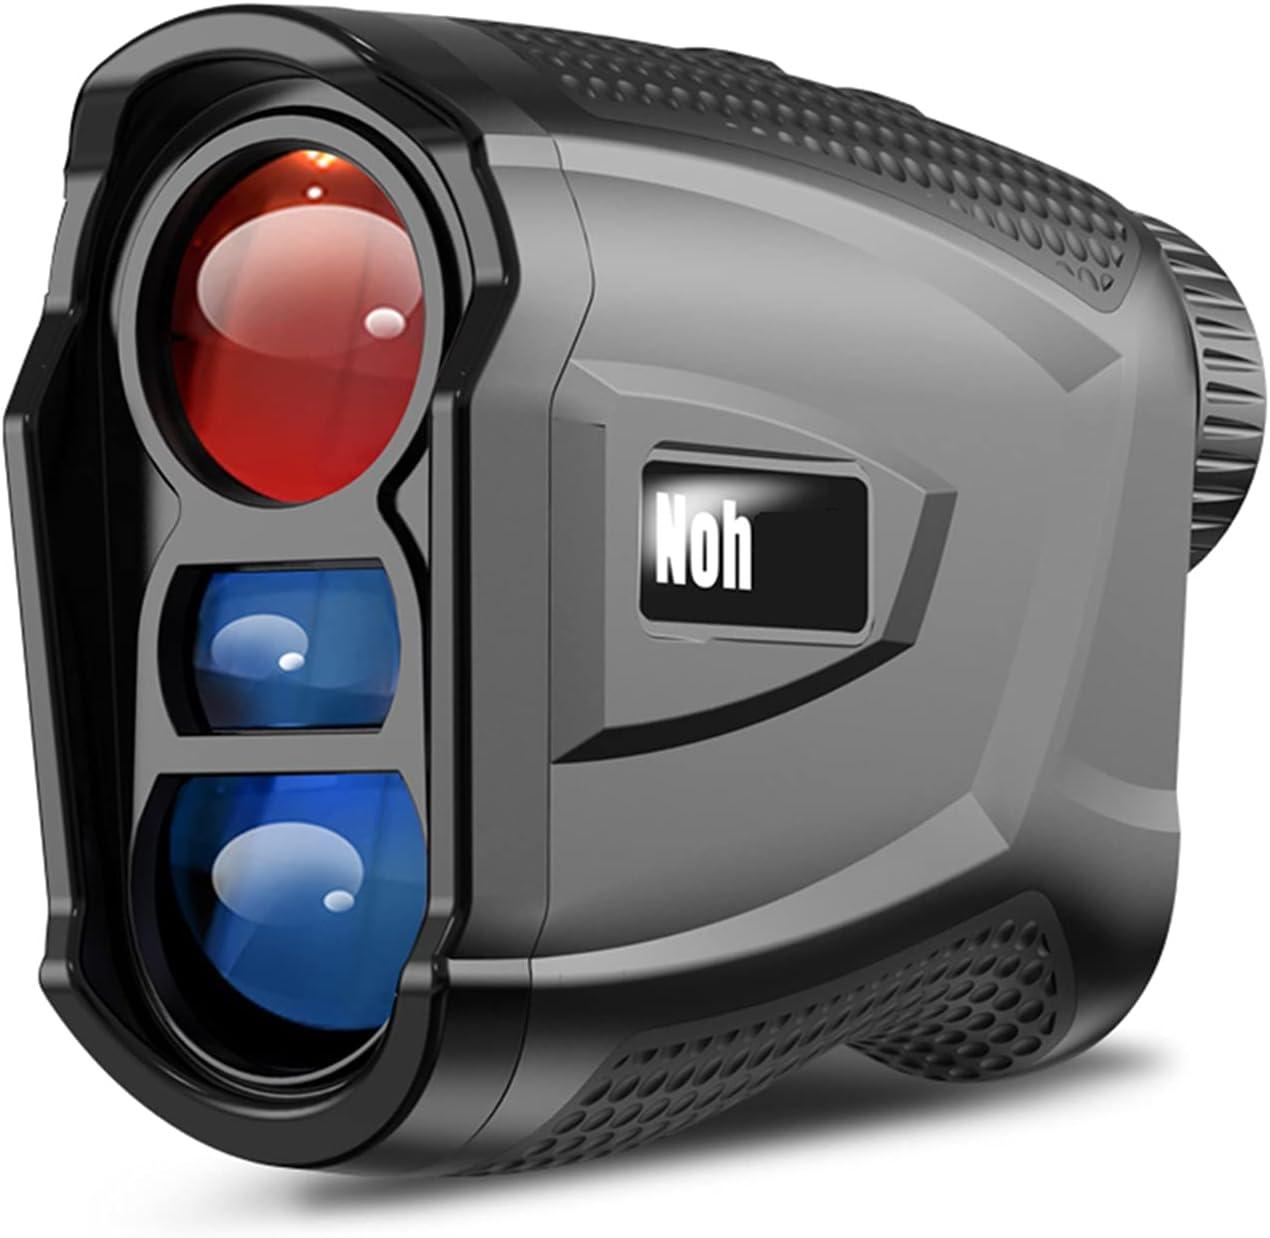 CAMILYIN Telémetro de Golf 600 m, Telémetro Láser Golf Medición de La Velocidad, Aumento 6.5X y Carga USB, Impermeable IP54, para Golf,Caza, Tiro con el Arco,Negro